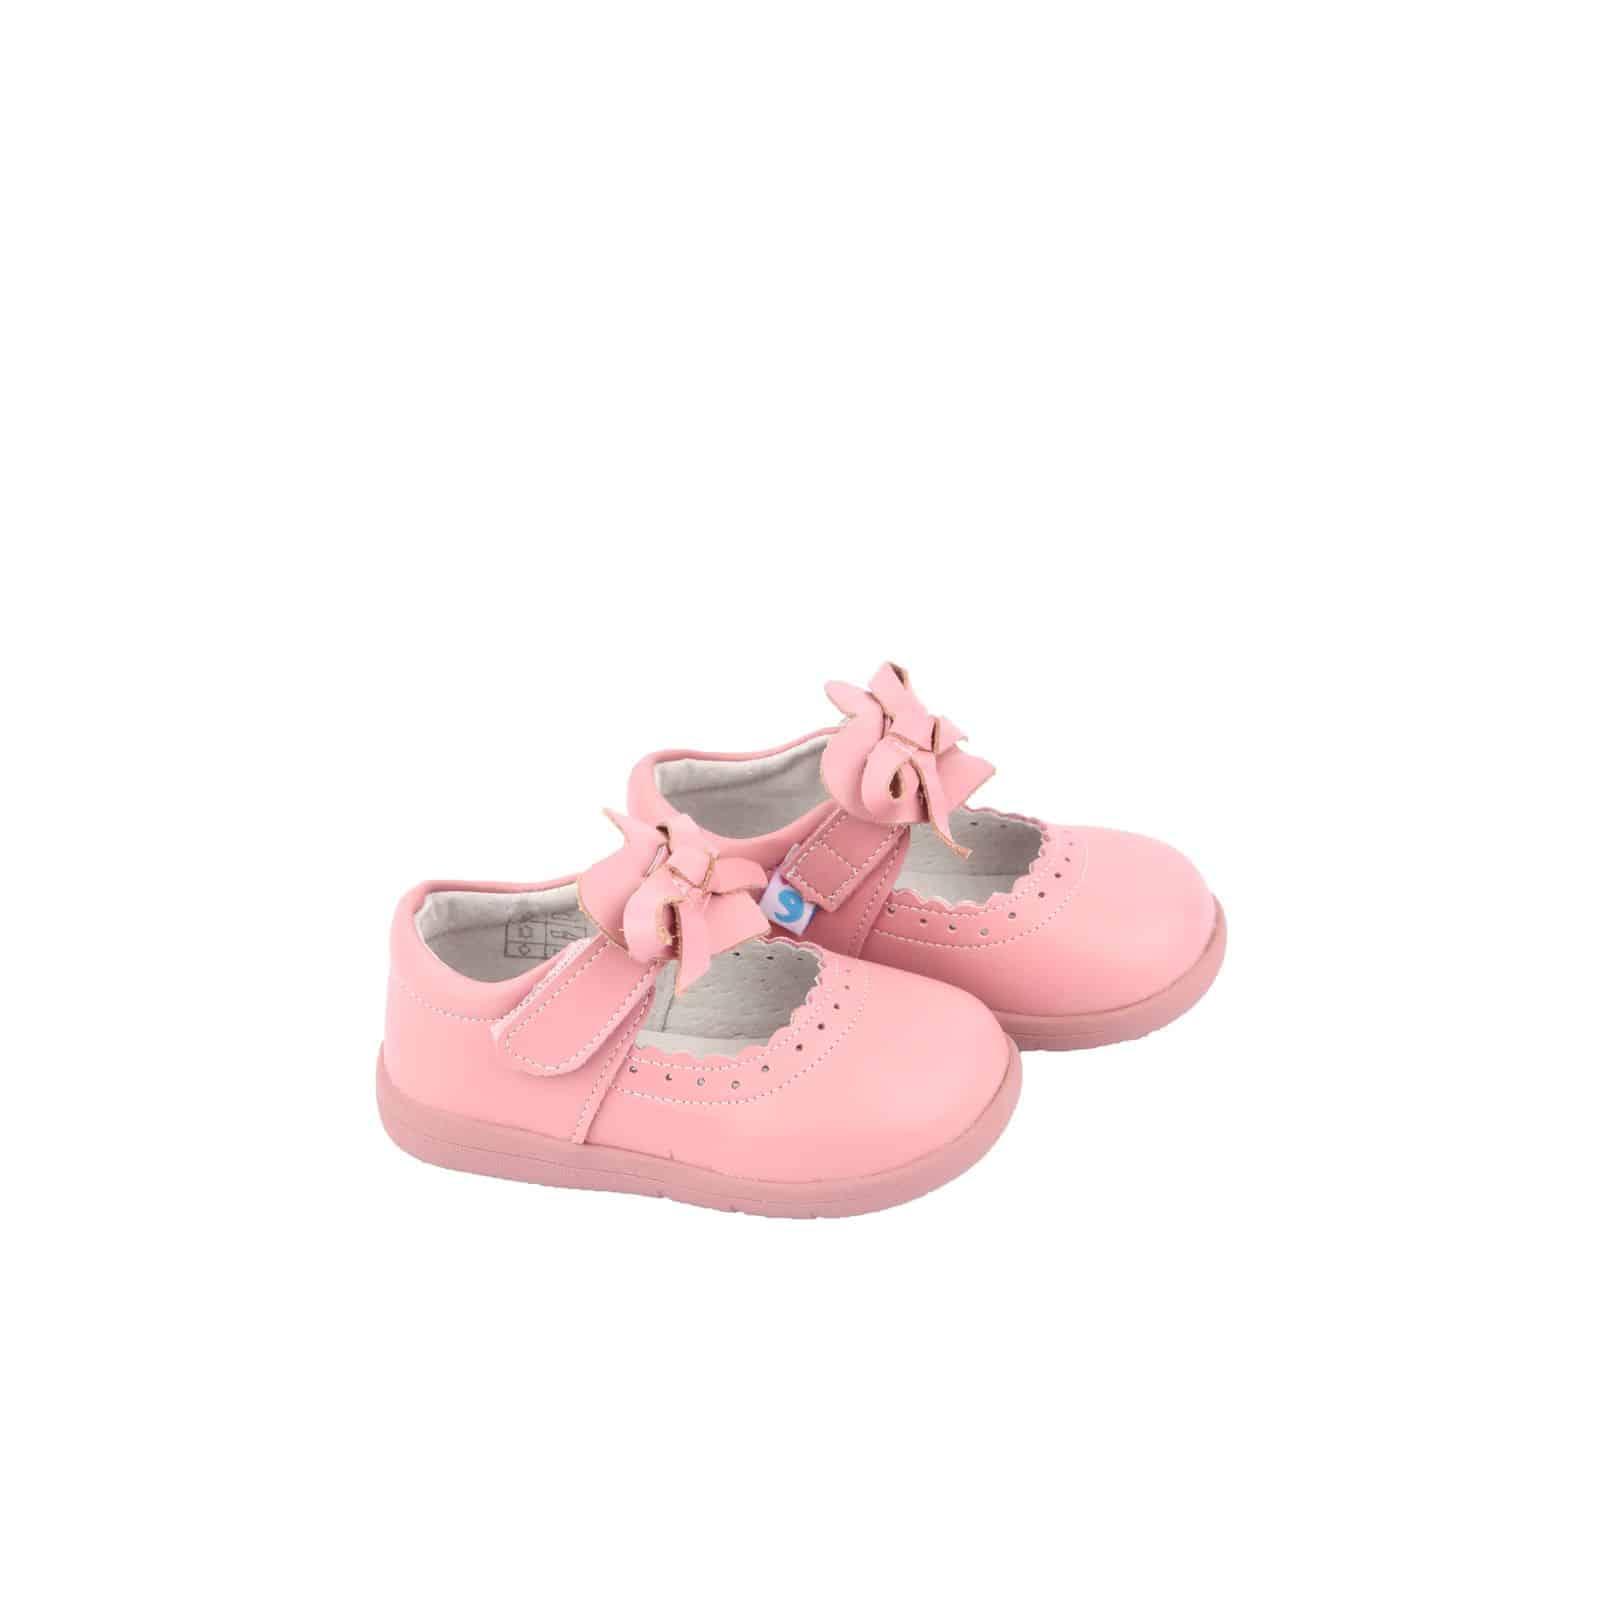 6425ae8b0b2ec Chaussures semelle souple PINK